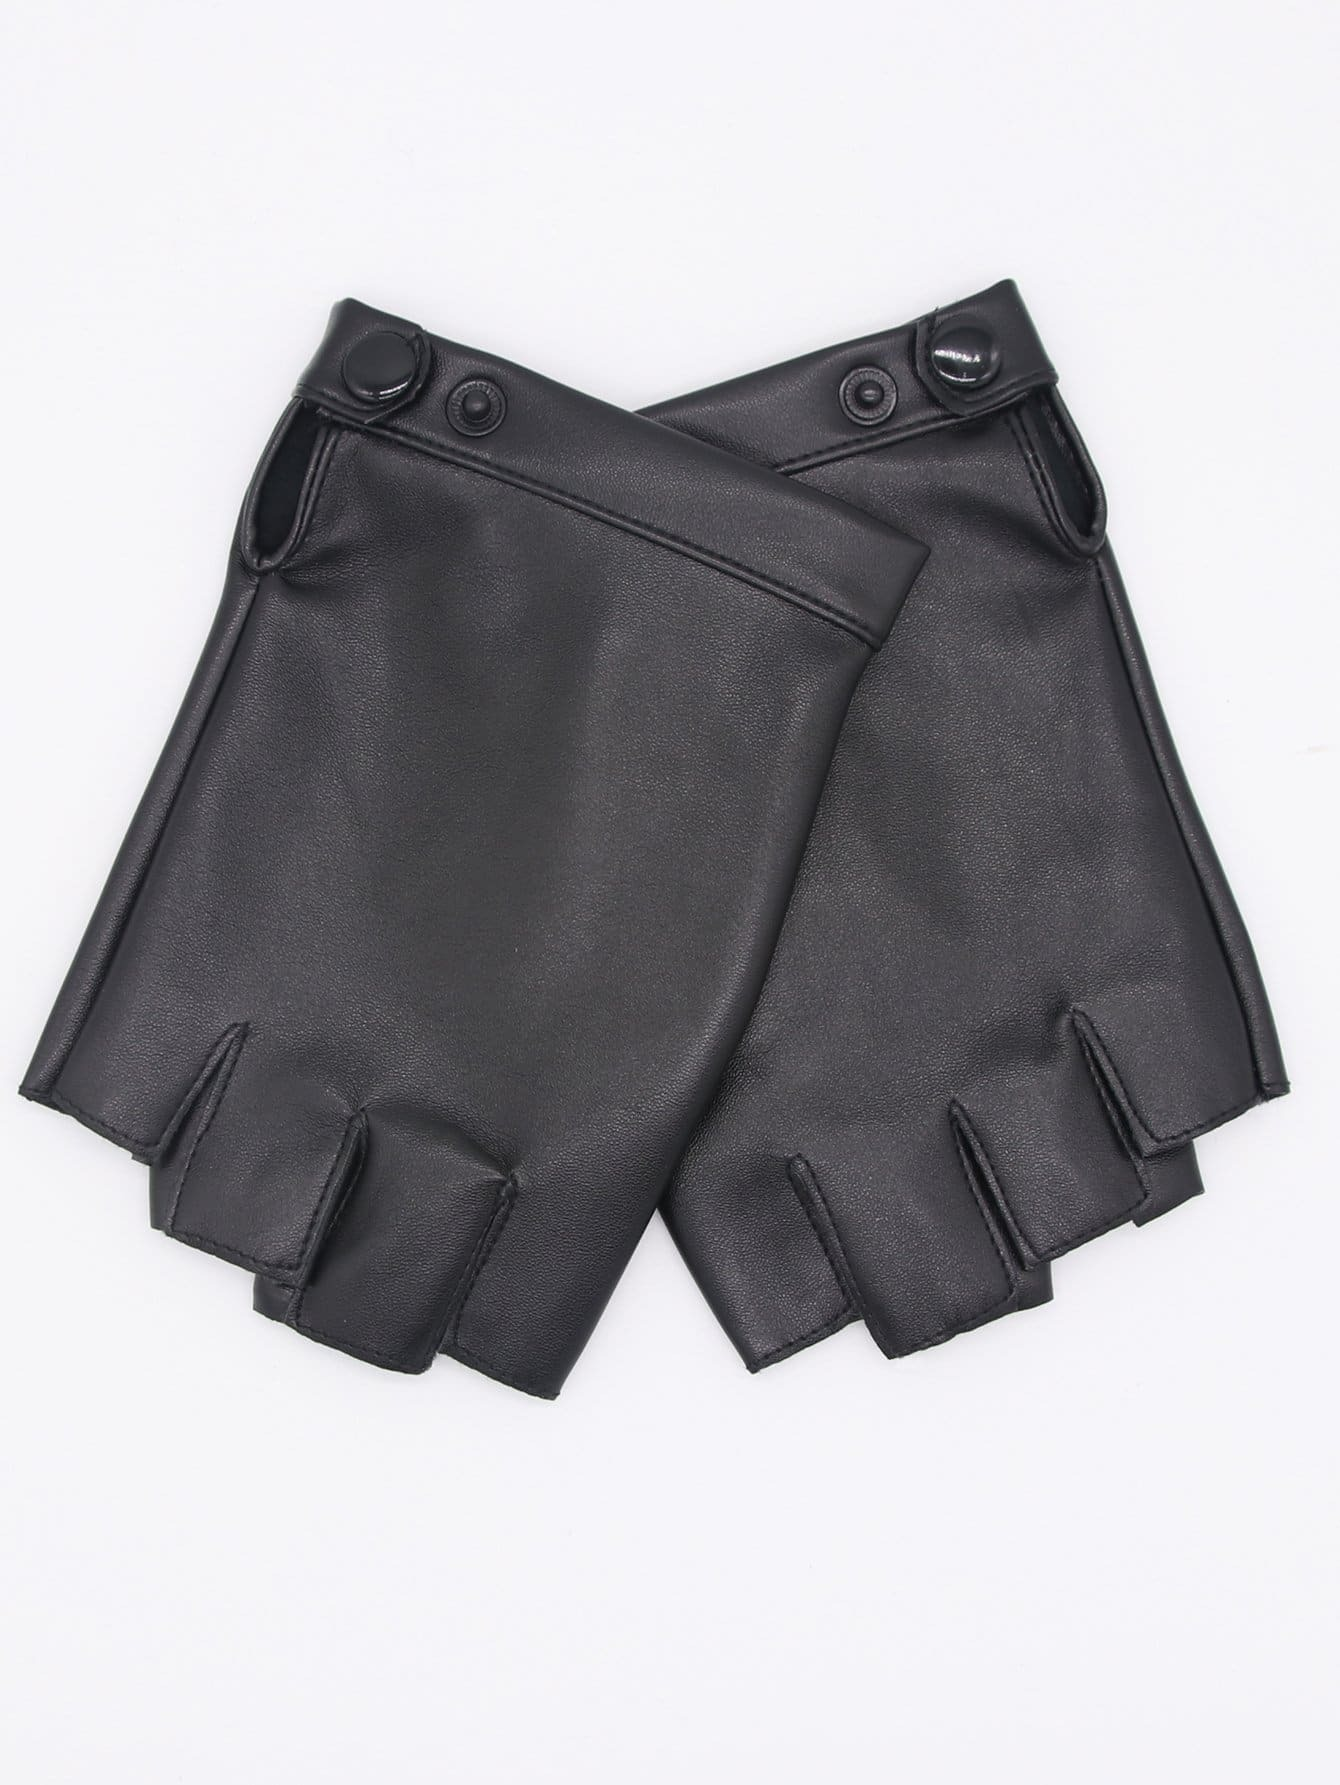 Мужчины Пряжки Перчатки Половина Finger